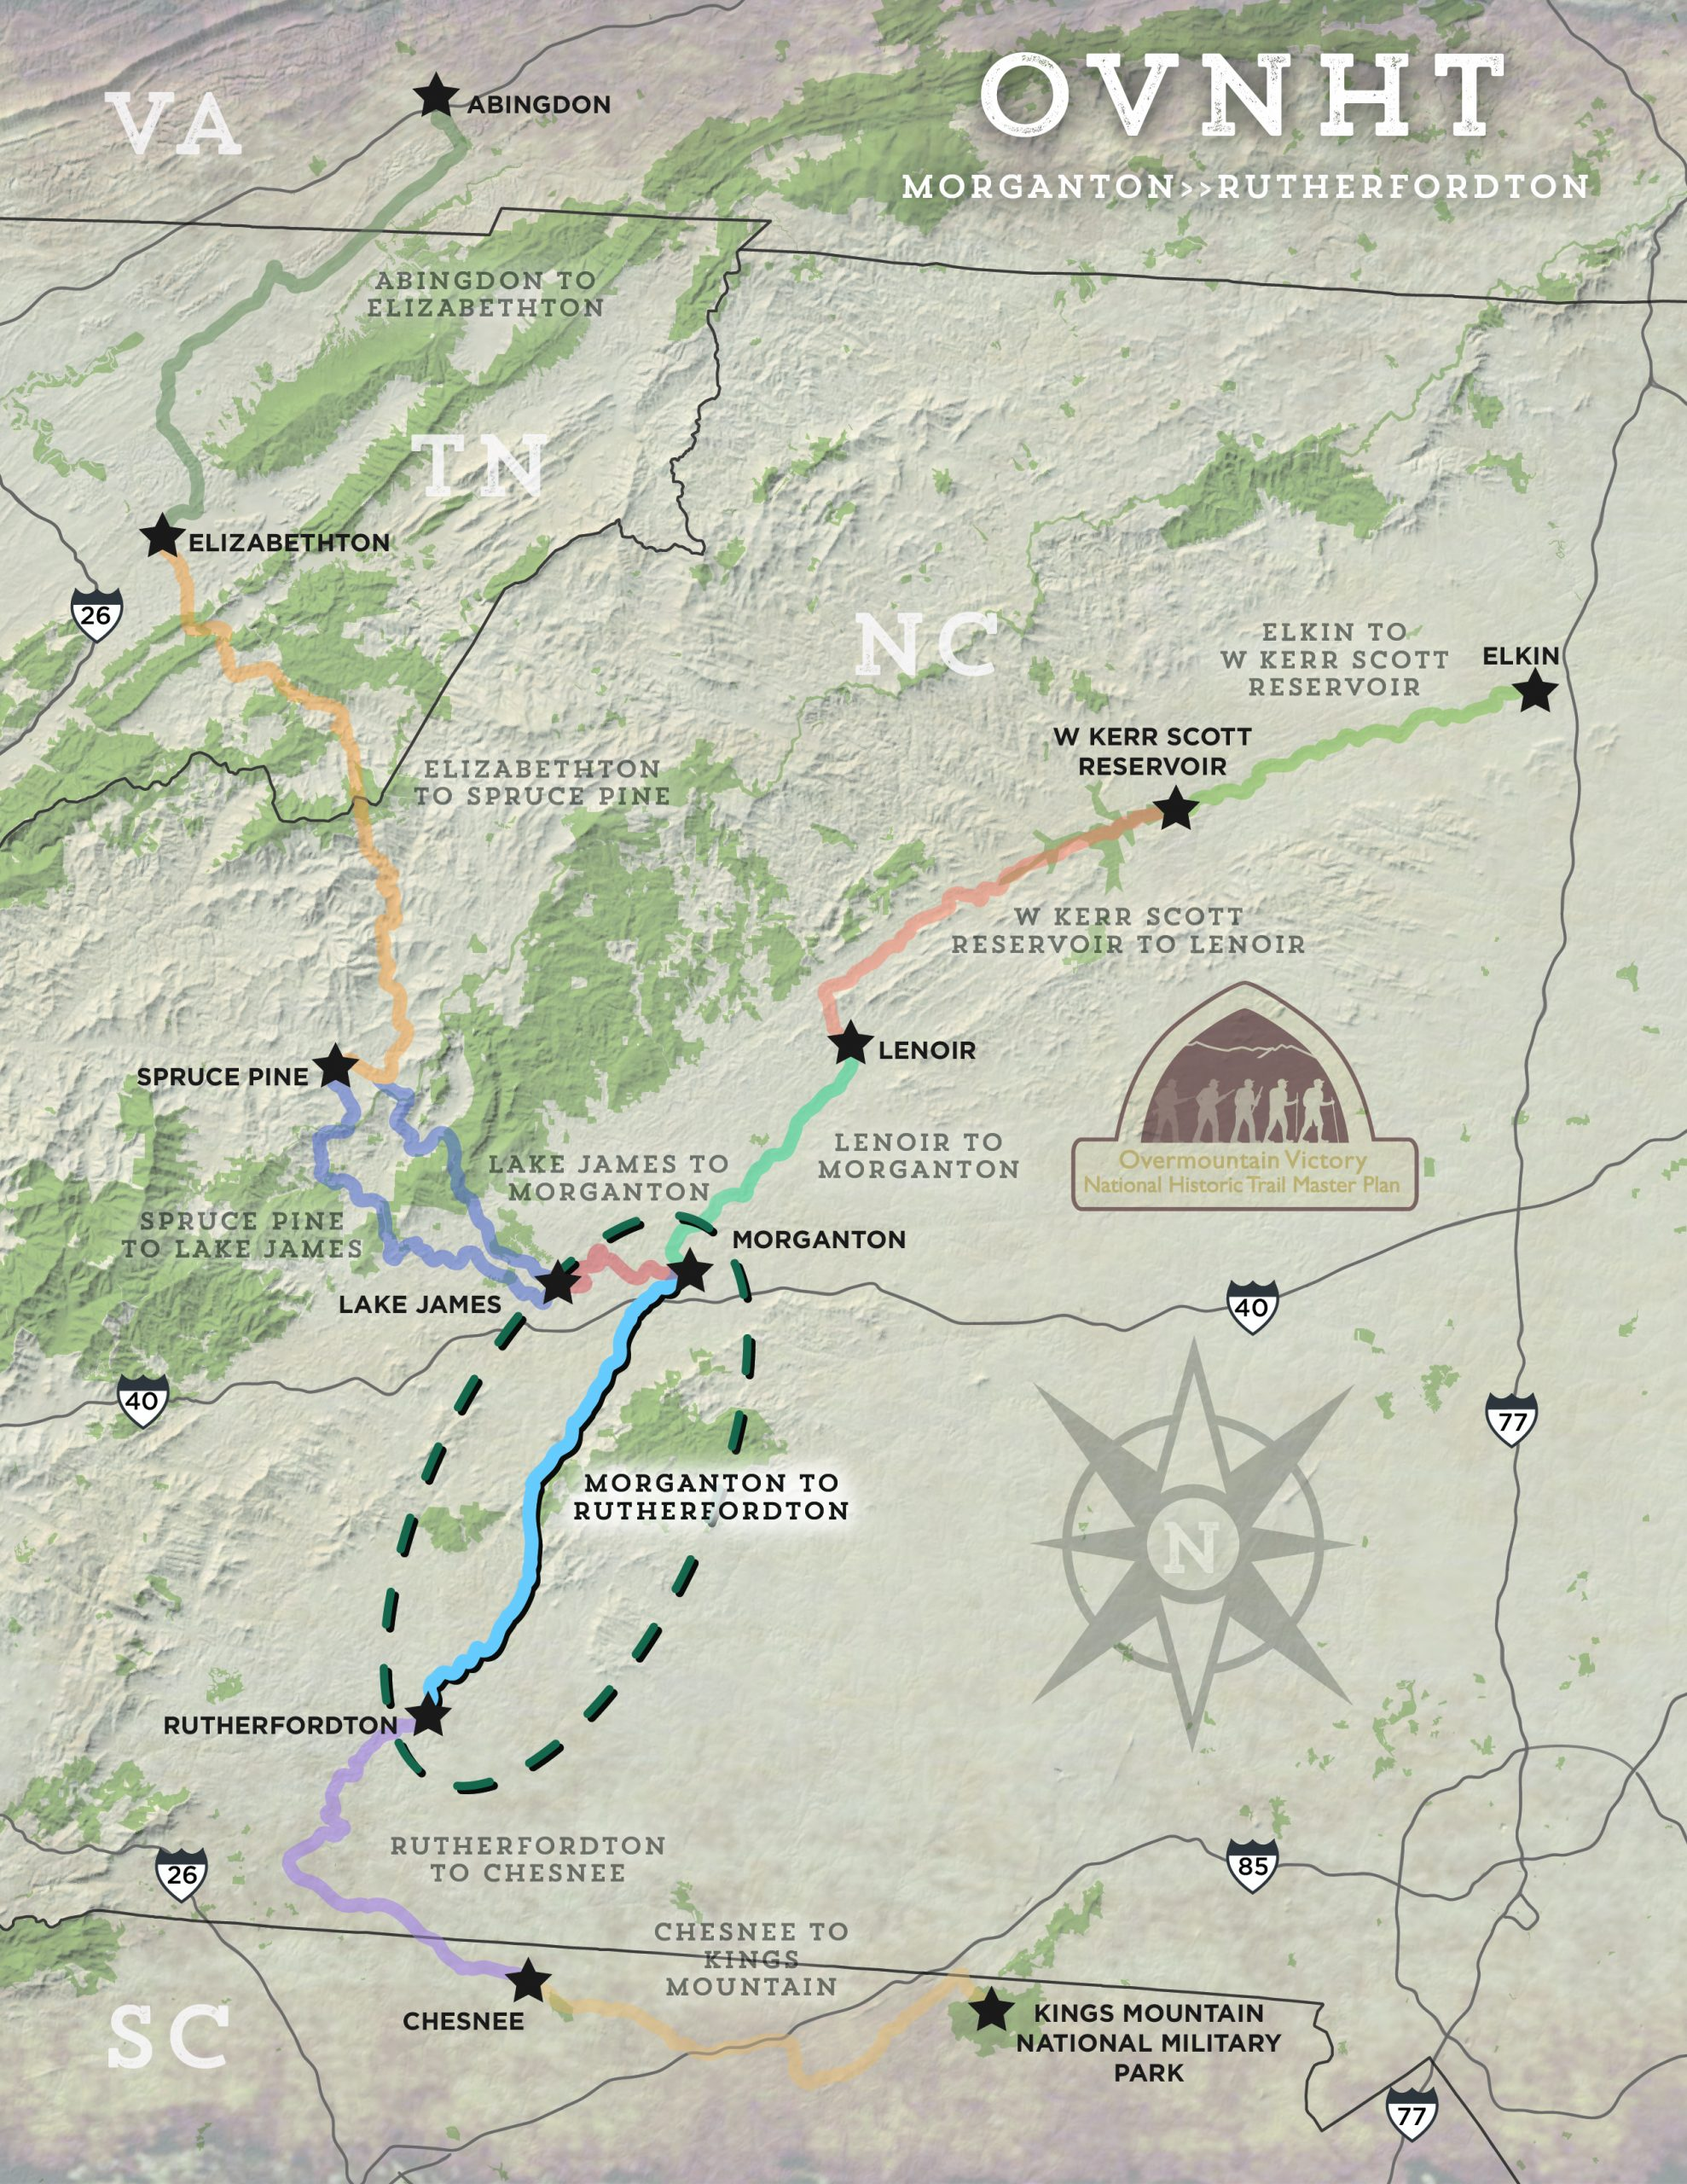 Morganton to Rutherfordton section map